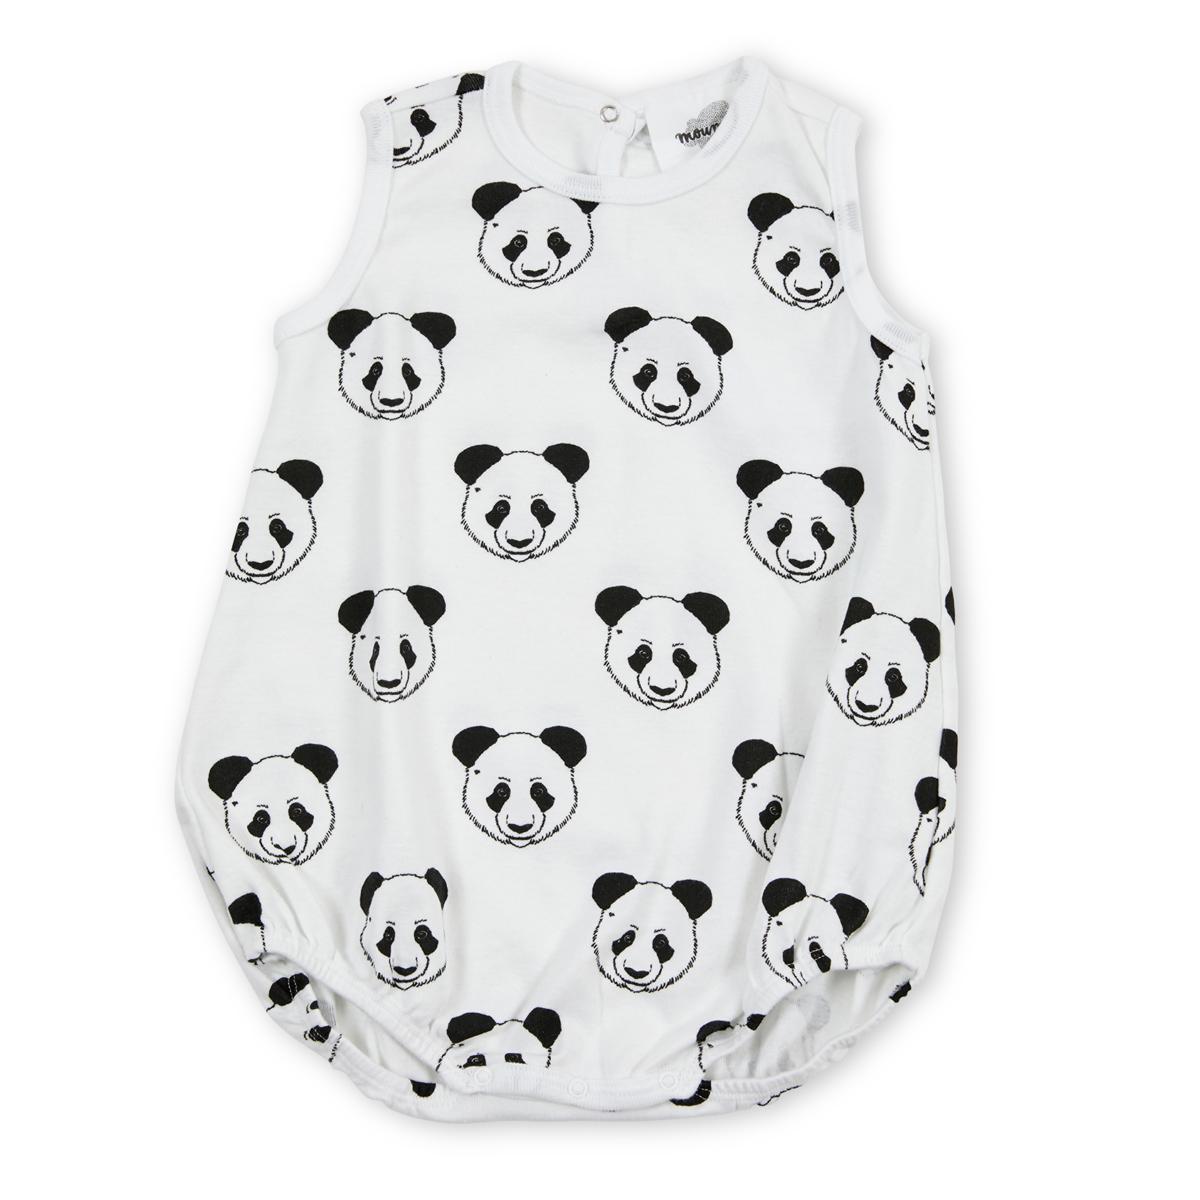 Robe & Combinaison Baba Barboteuse Panda - 6 Mois